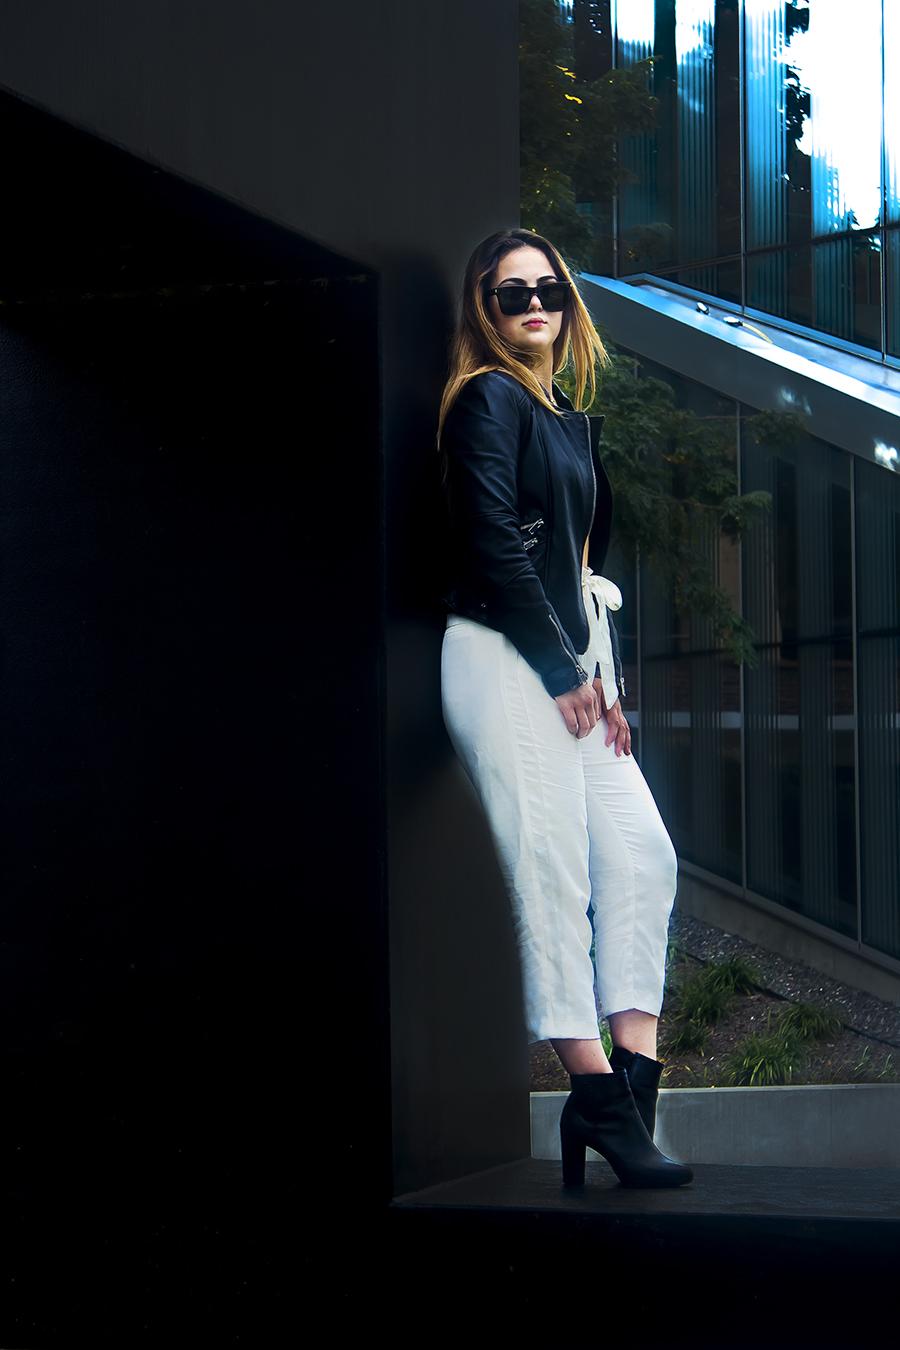 RIA_VAIDYA_photography_fashion_tony_ward_studio_leather_jacket_dark_sunglasses_white_pants